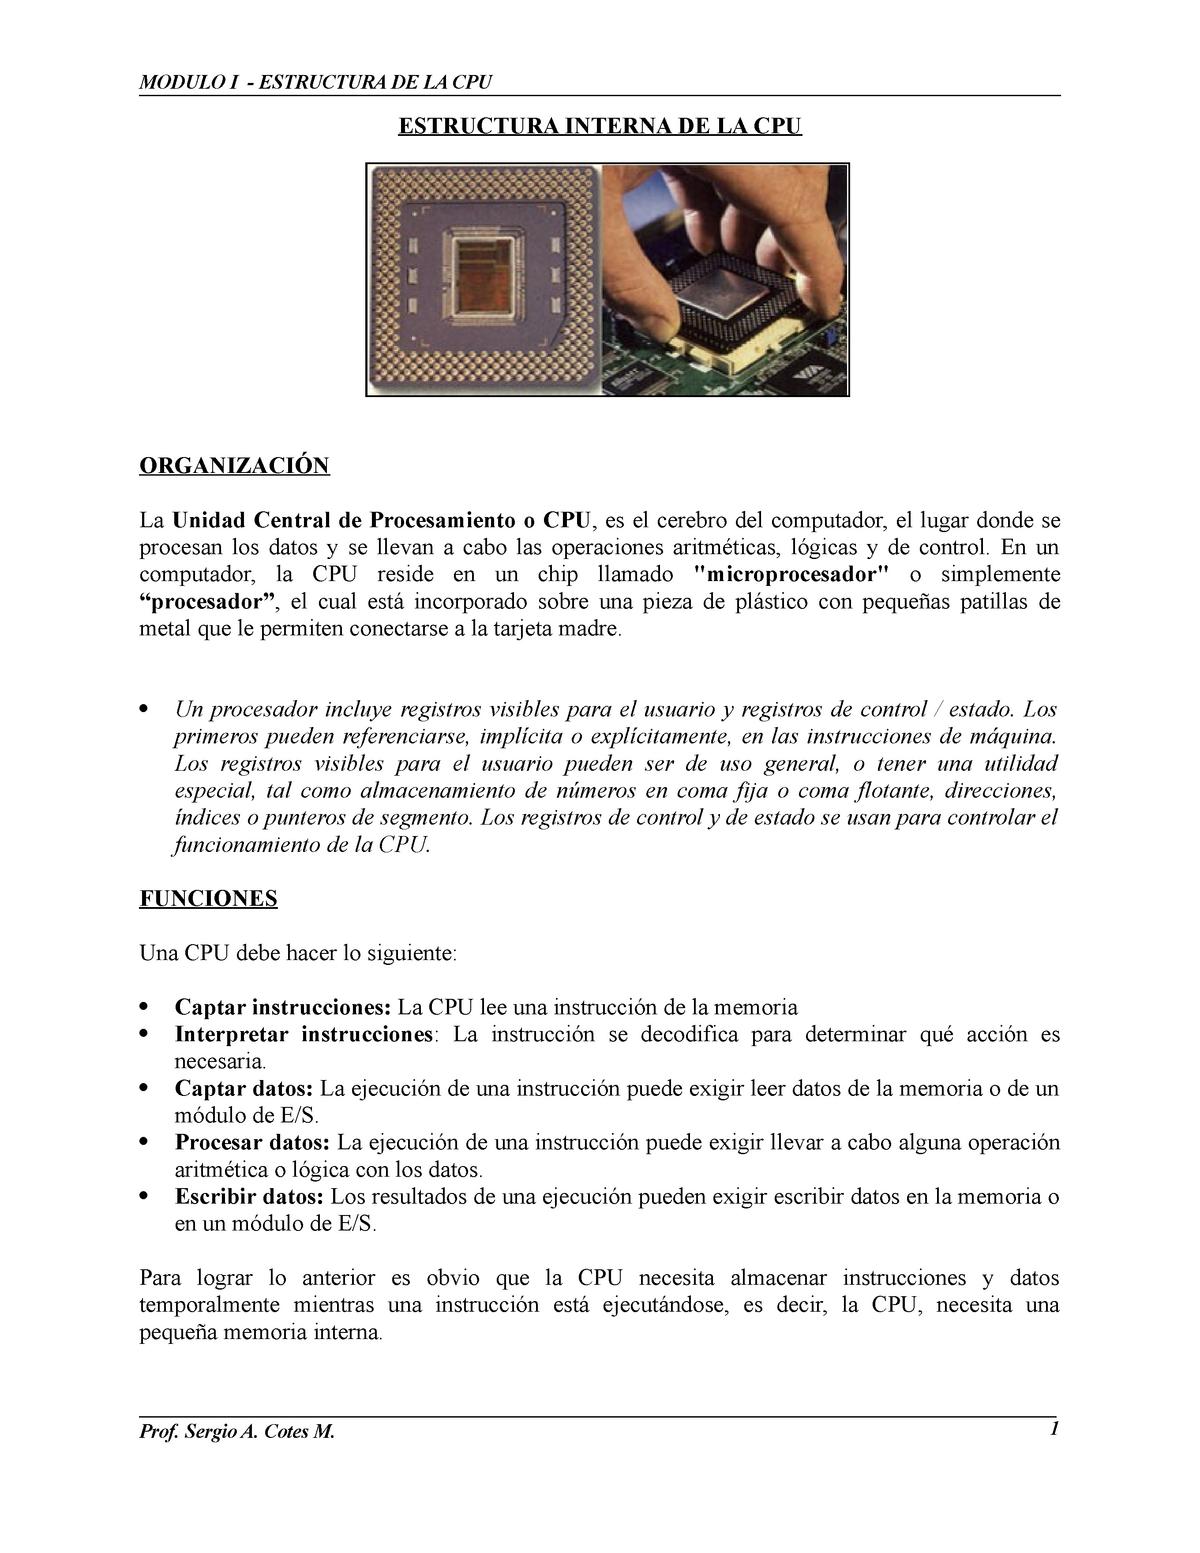 Cpu Estructura Interna Organiz Y Arquit De Comput I 1336